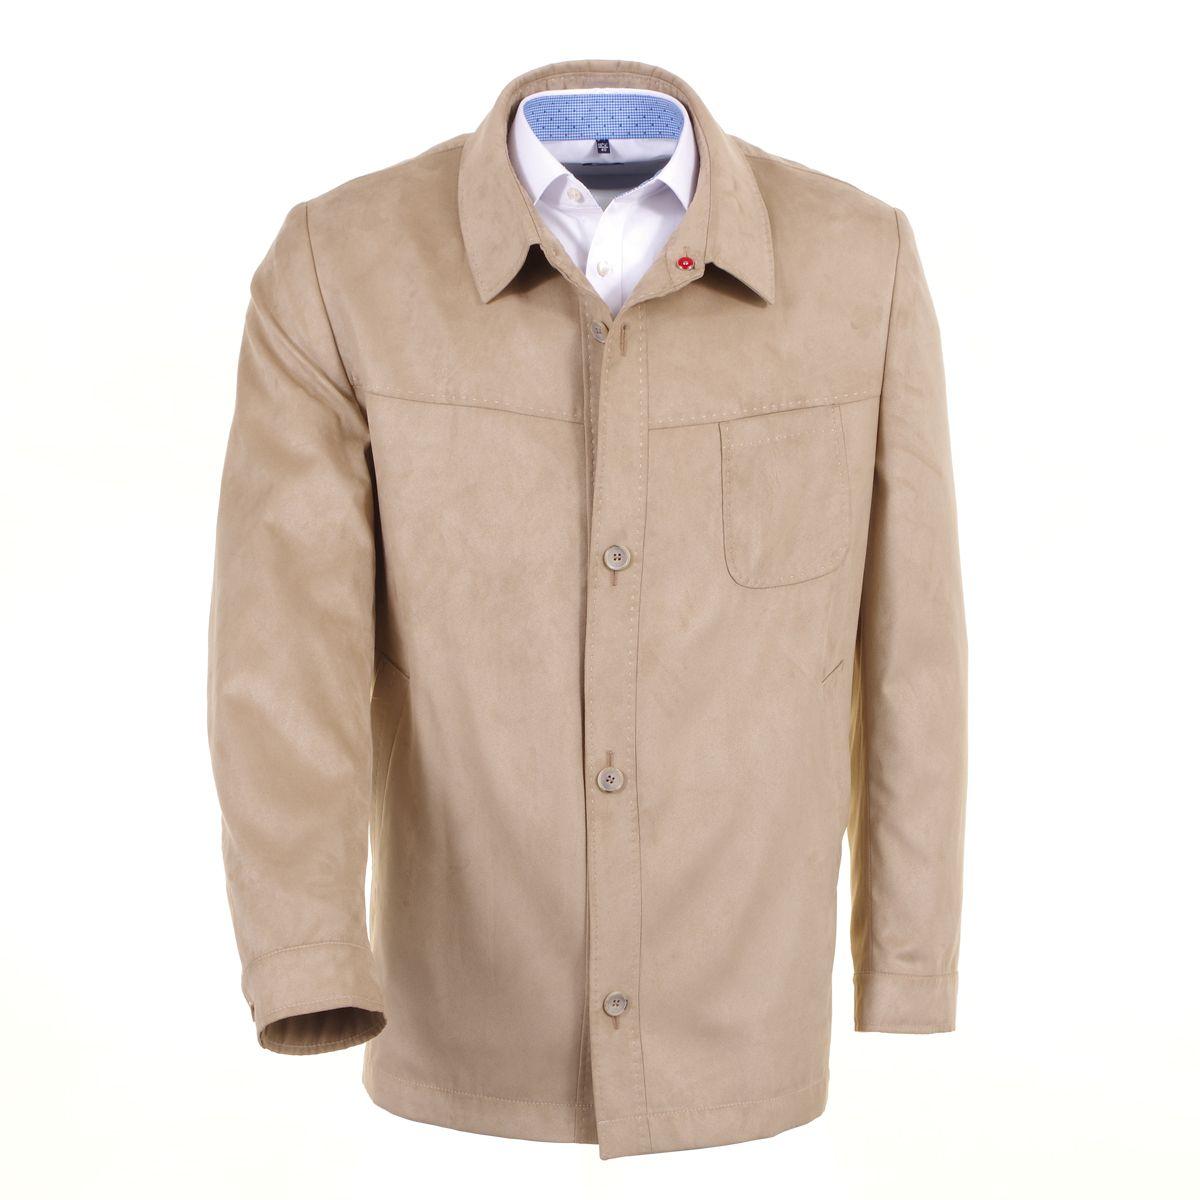 veste skintex sur chemise beige grande taille jusqu 39 au 72 size factory maneven. Black Bedroom Furniture Sets. Home Design Ideas